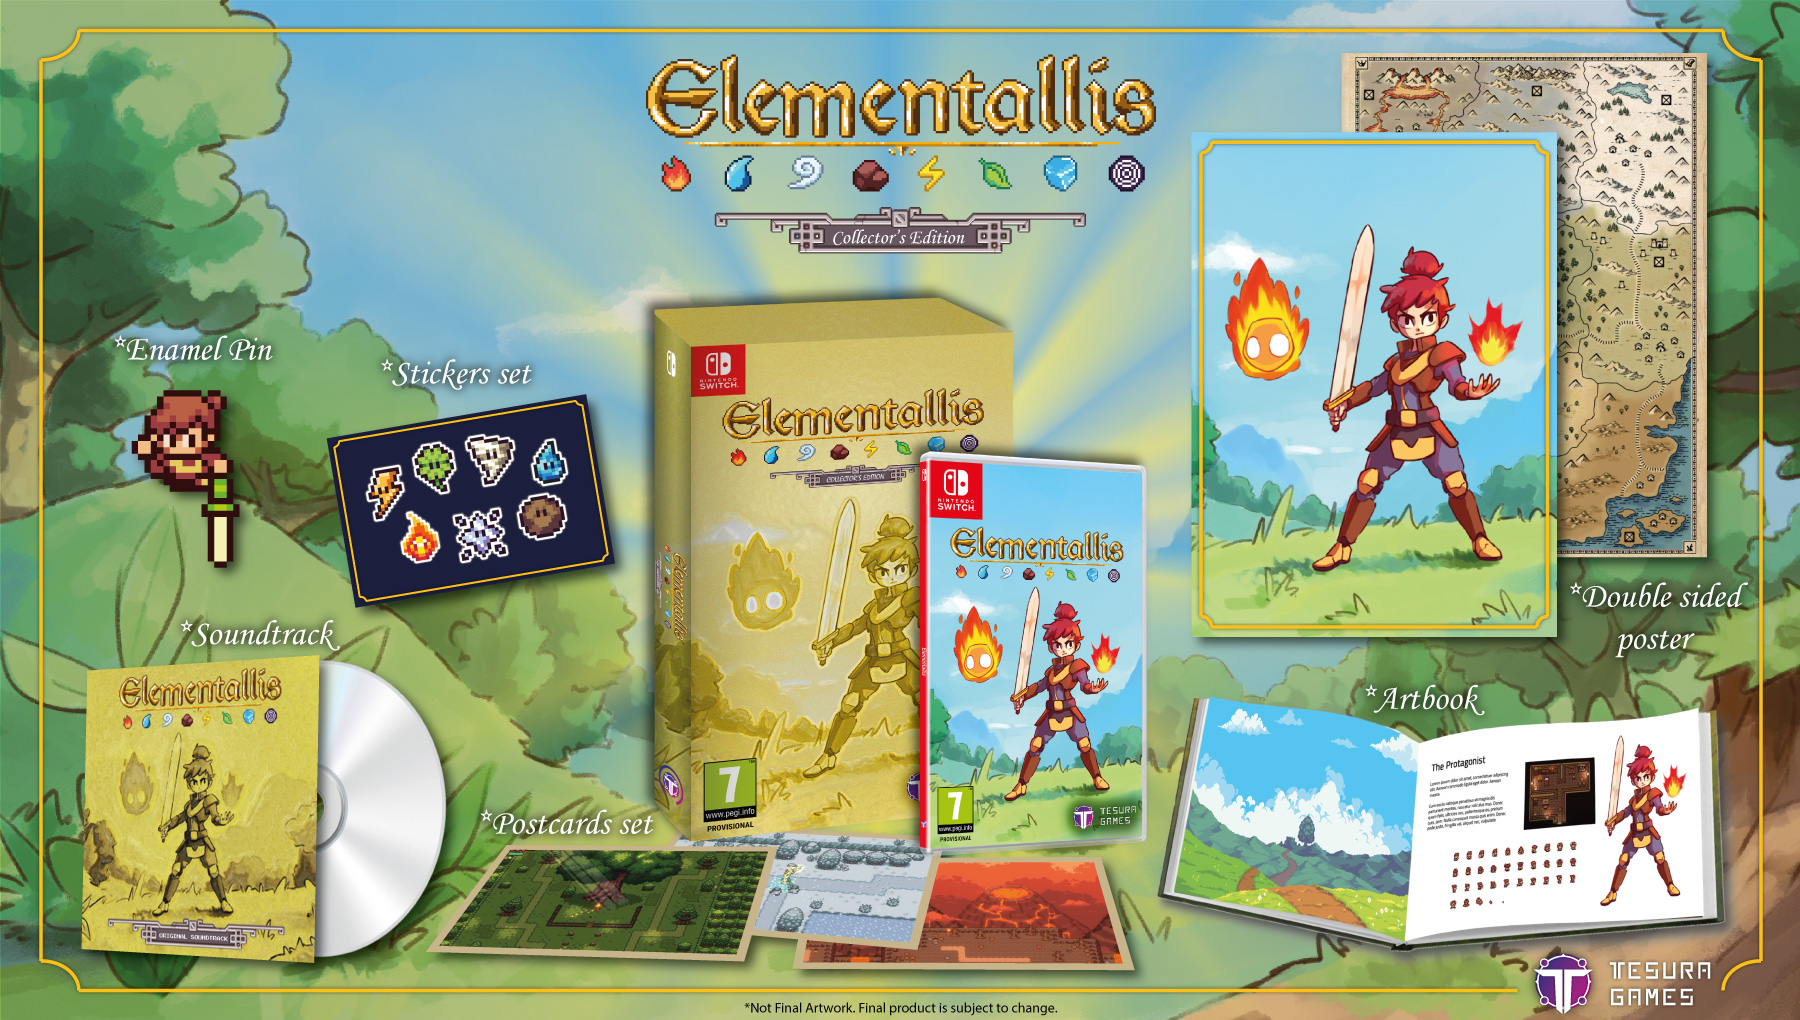 Elementallis Collector's Edition